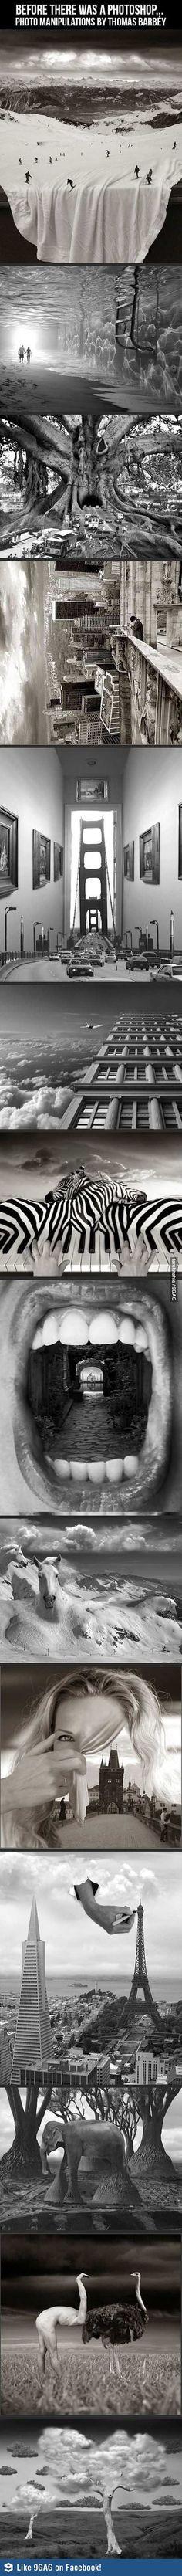 photo manipulations by thomas barbey